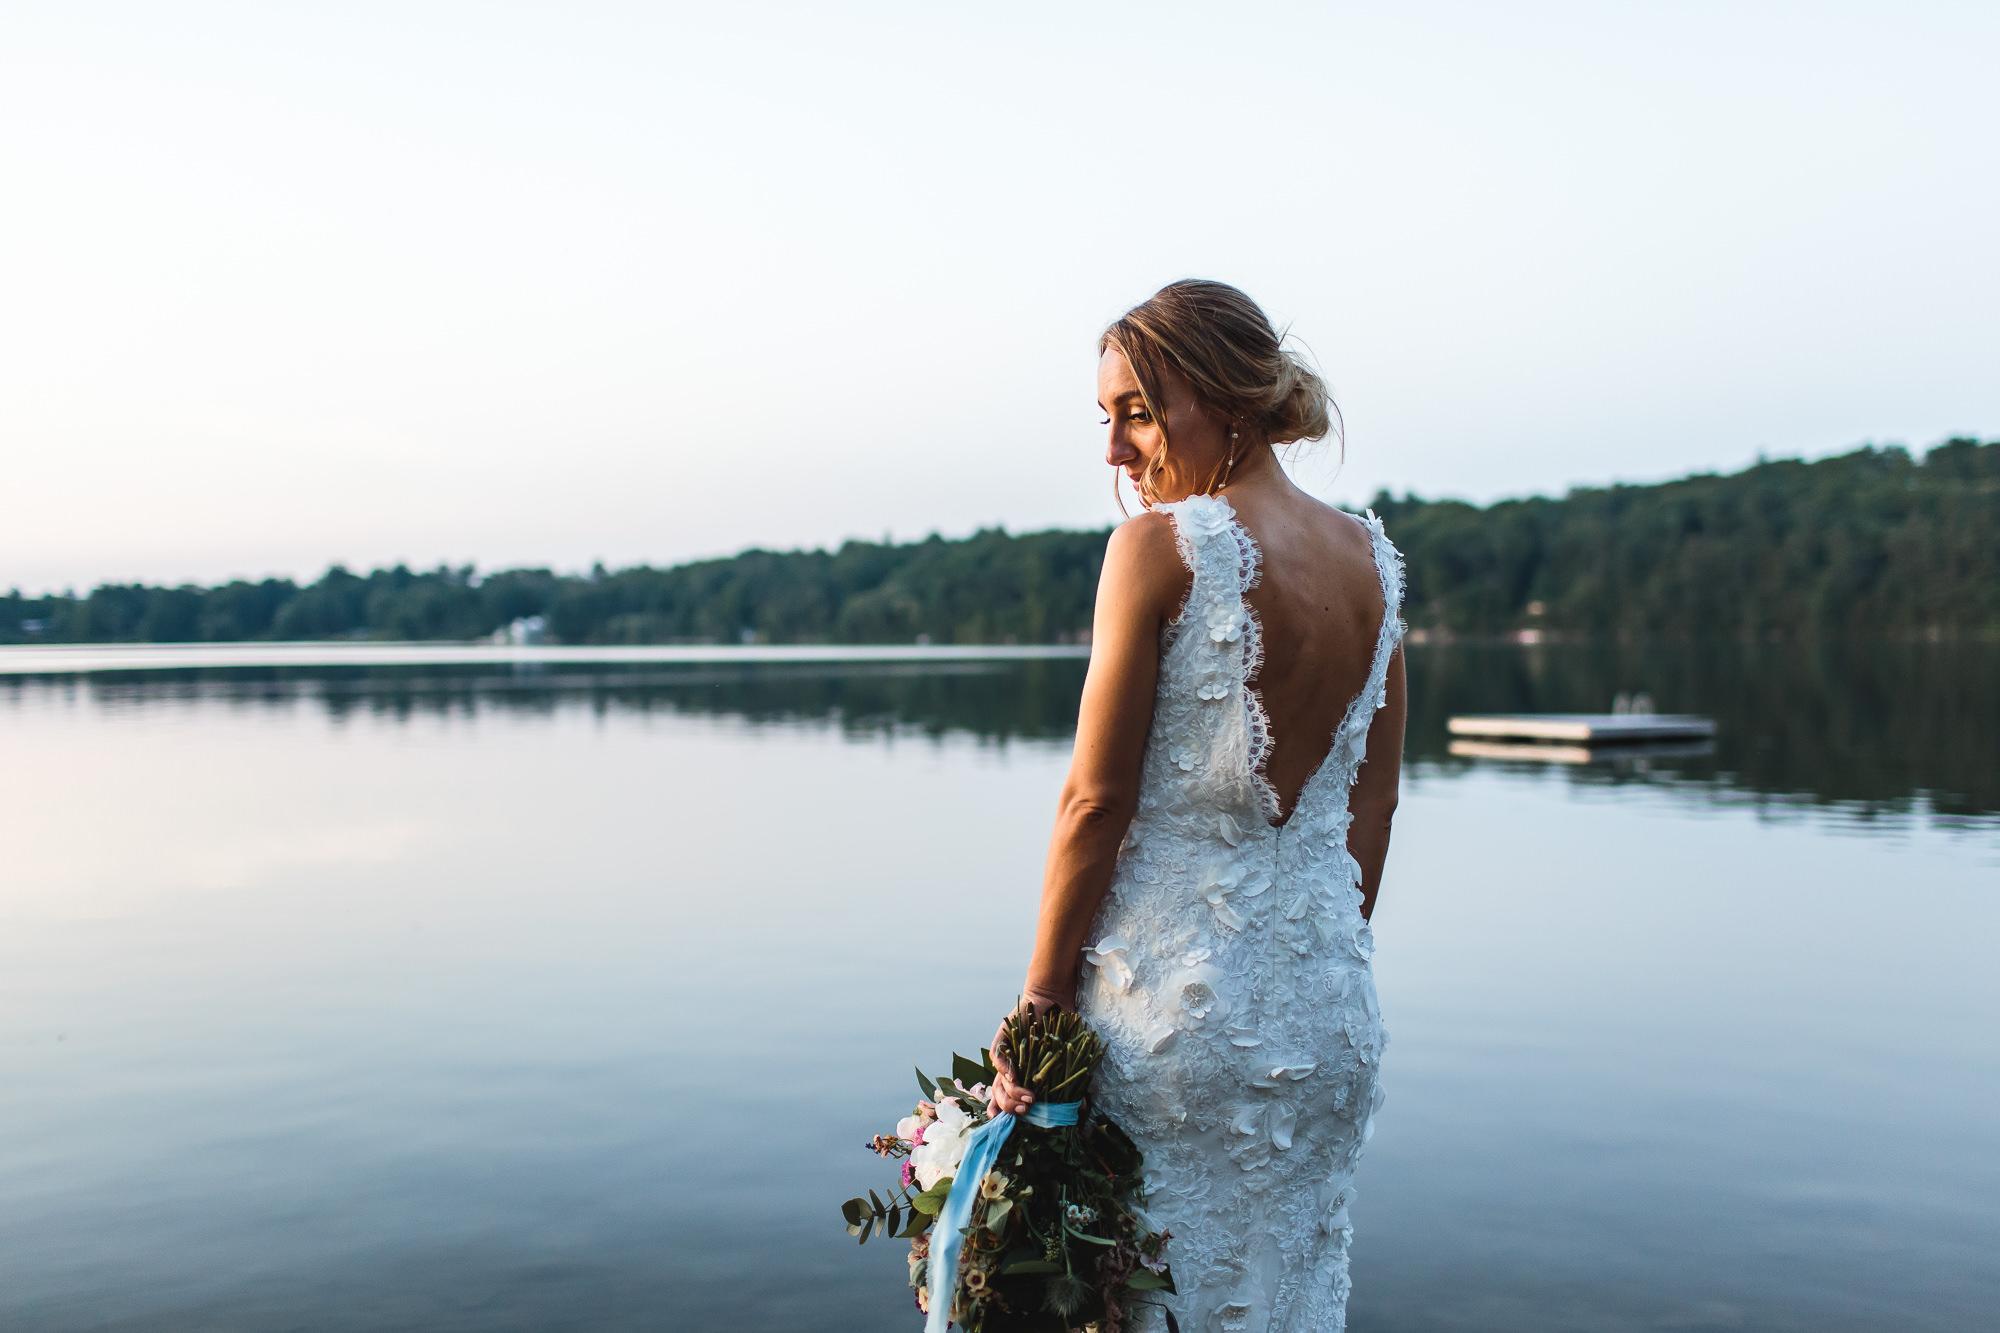 connecticut-summer-lake-wedding-emily-kirke-photography-upstyle (157 of 181).jpg